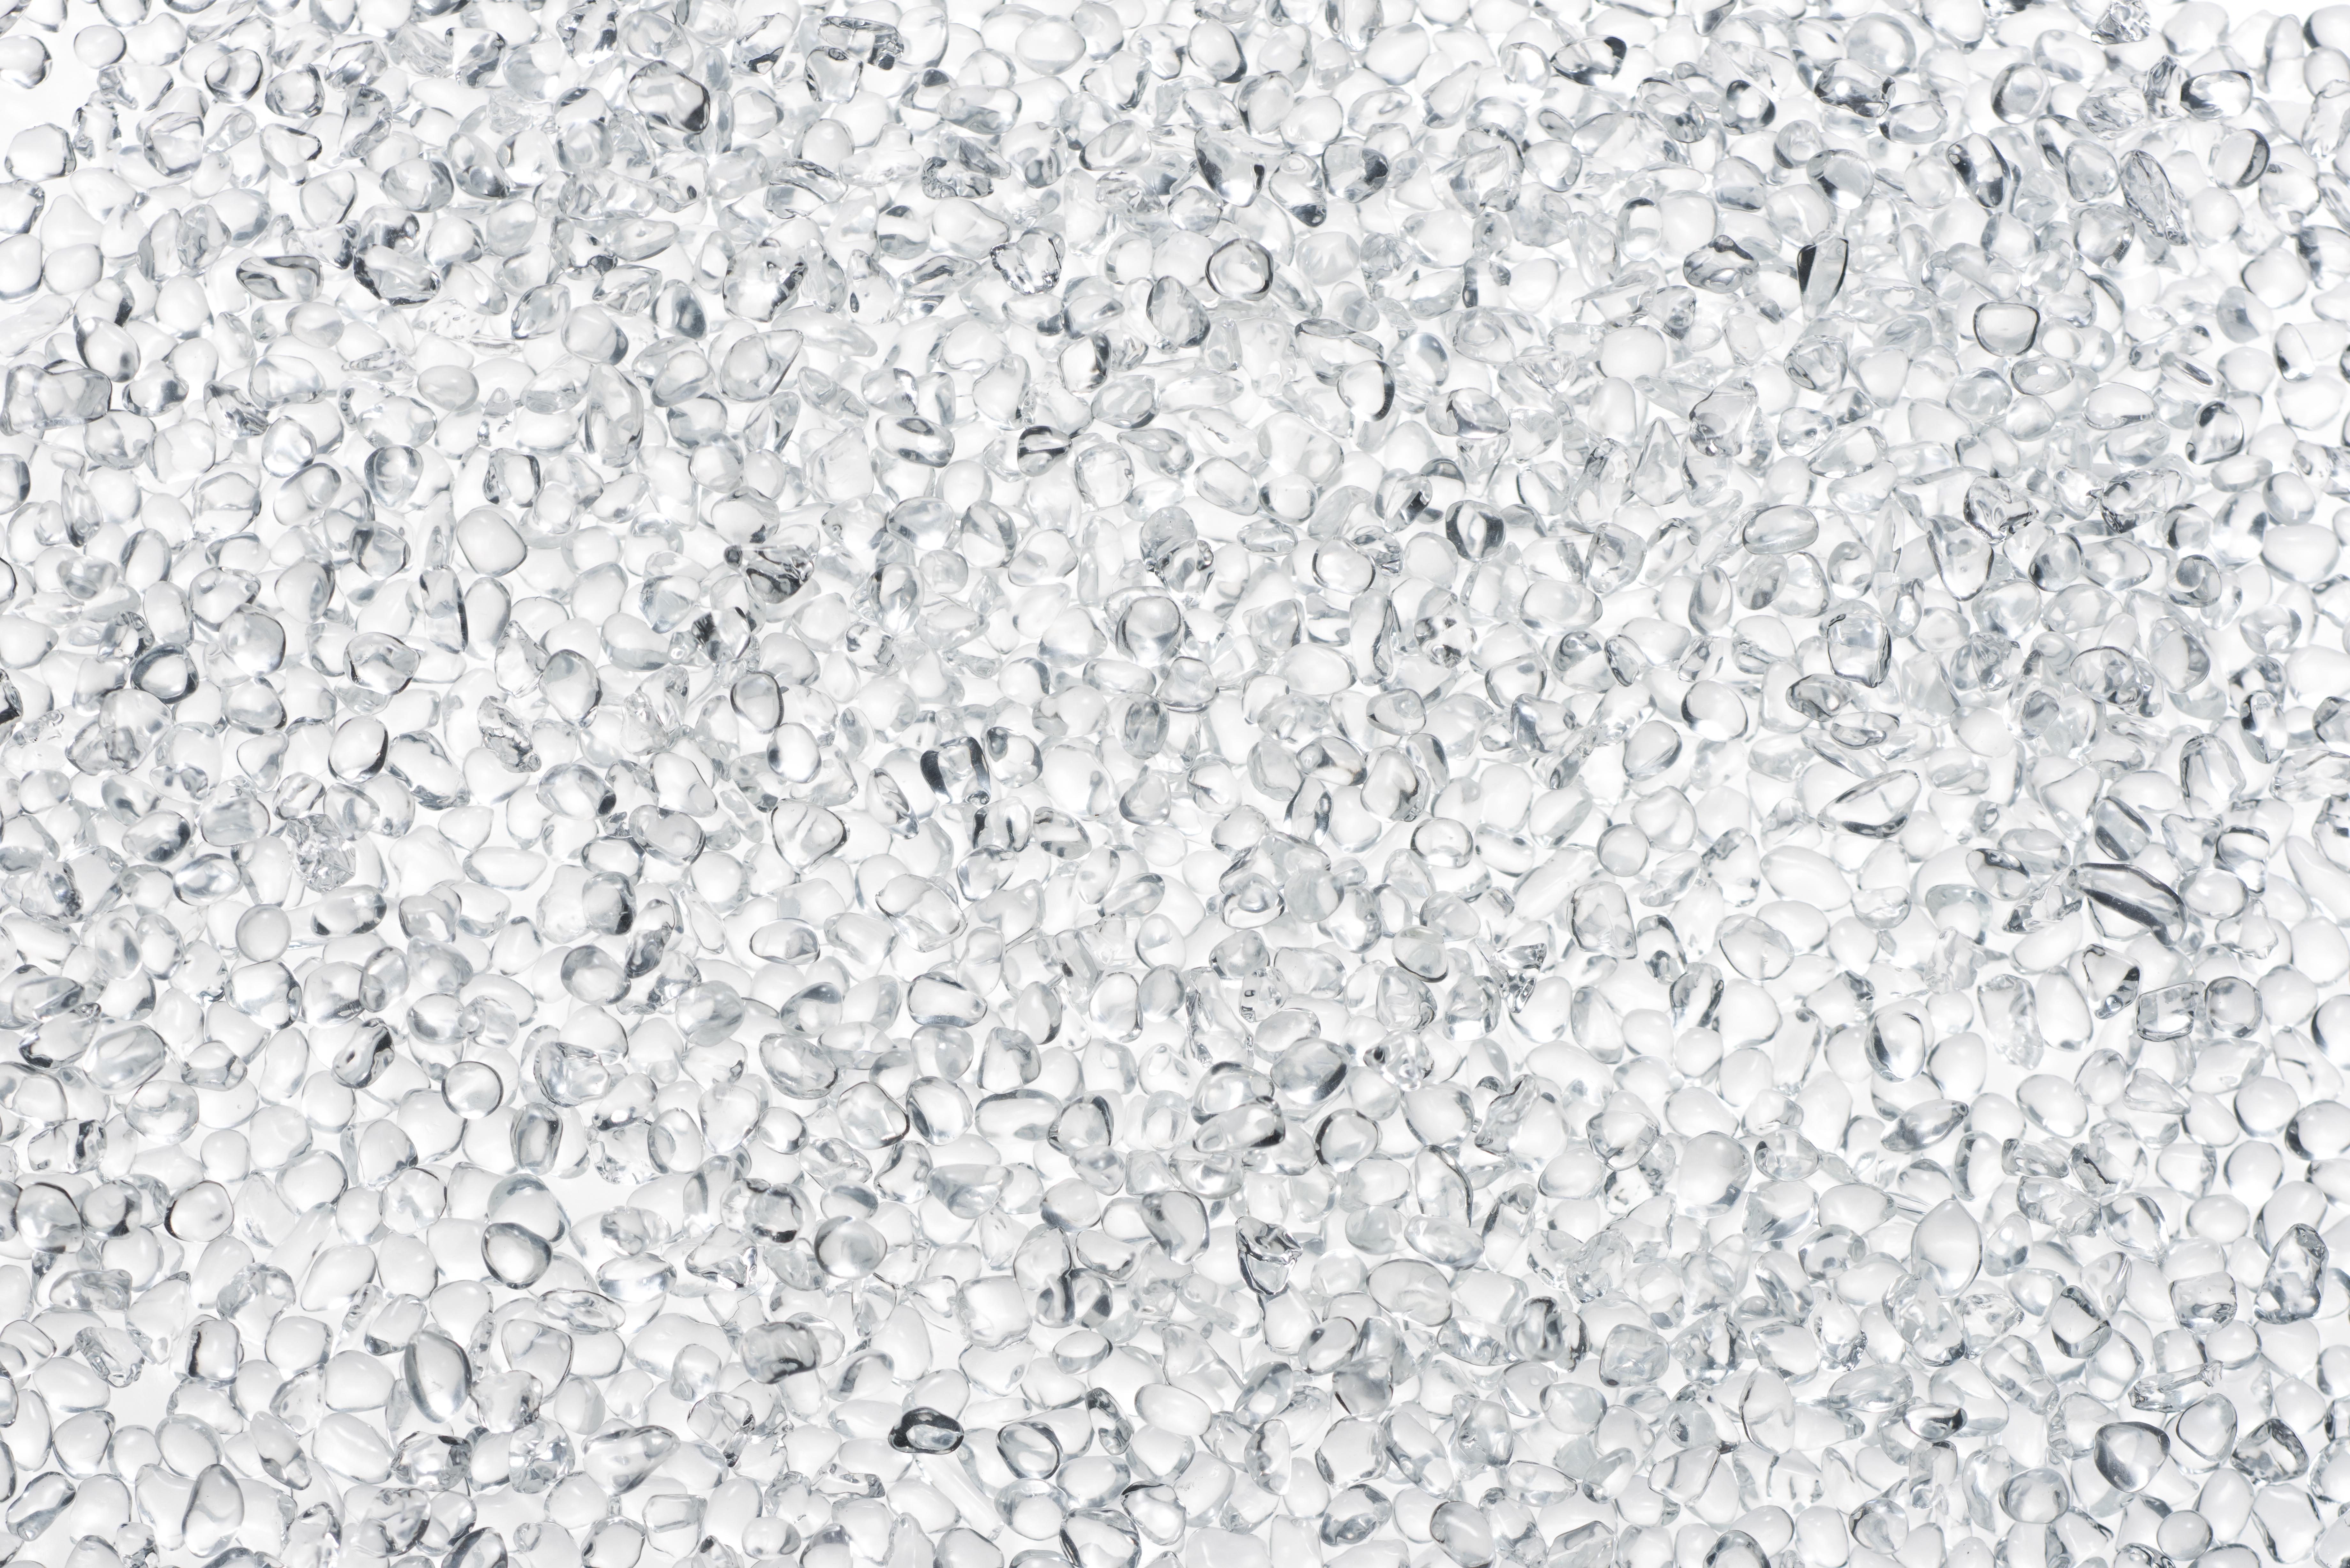 Transparent granules.